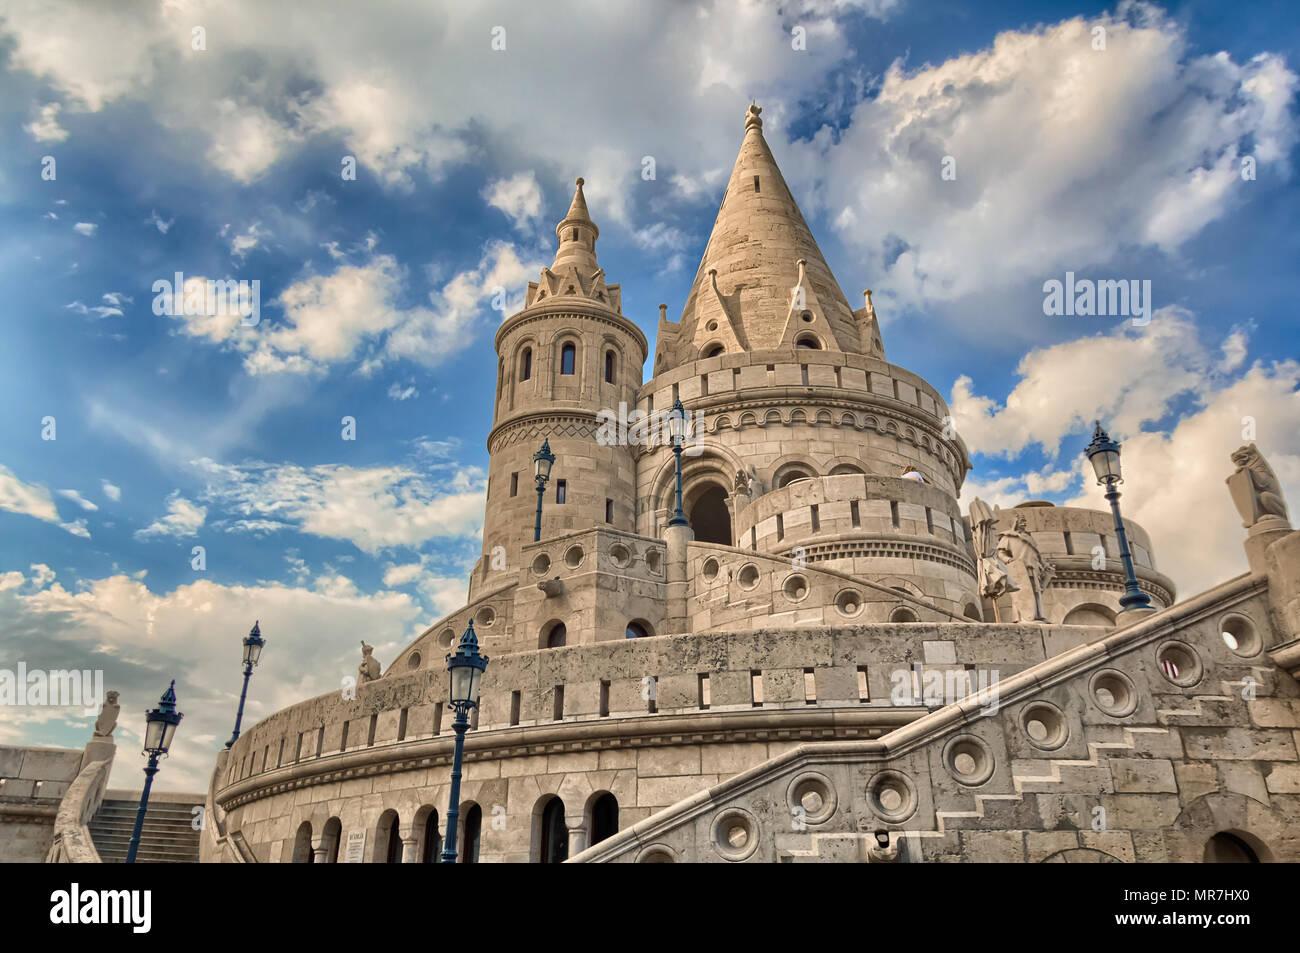 The Fisherman's Bastion, inside Buda Castle district, Budapest, Hungary. - Stock Image